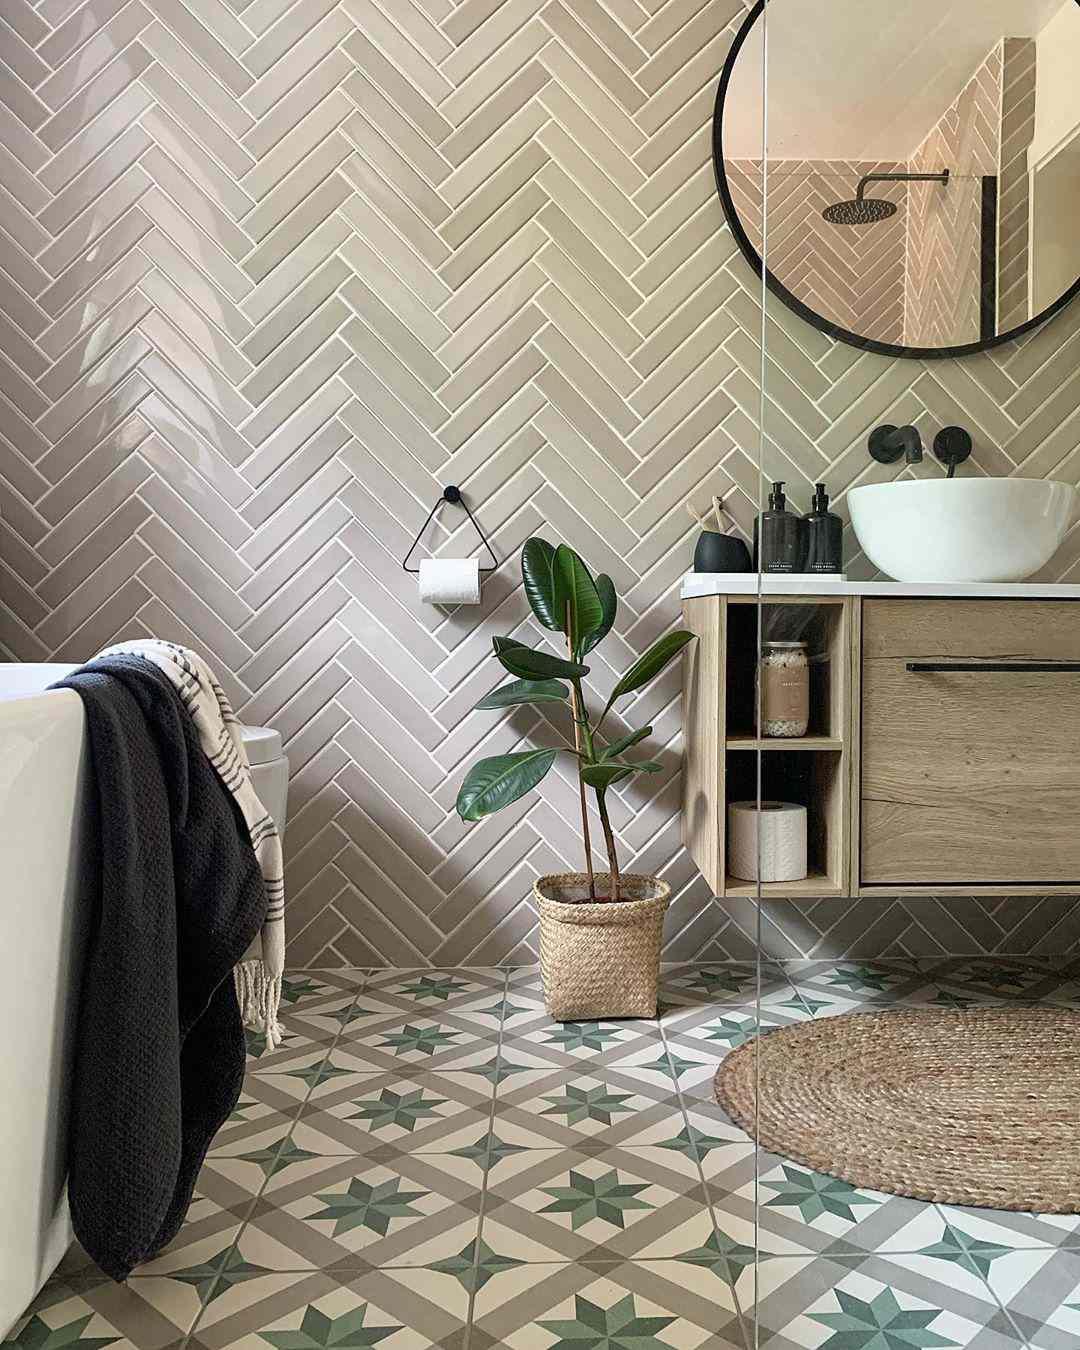 Bathroom with tan tiles